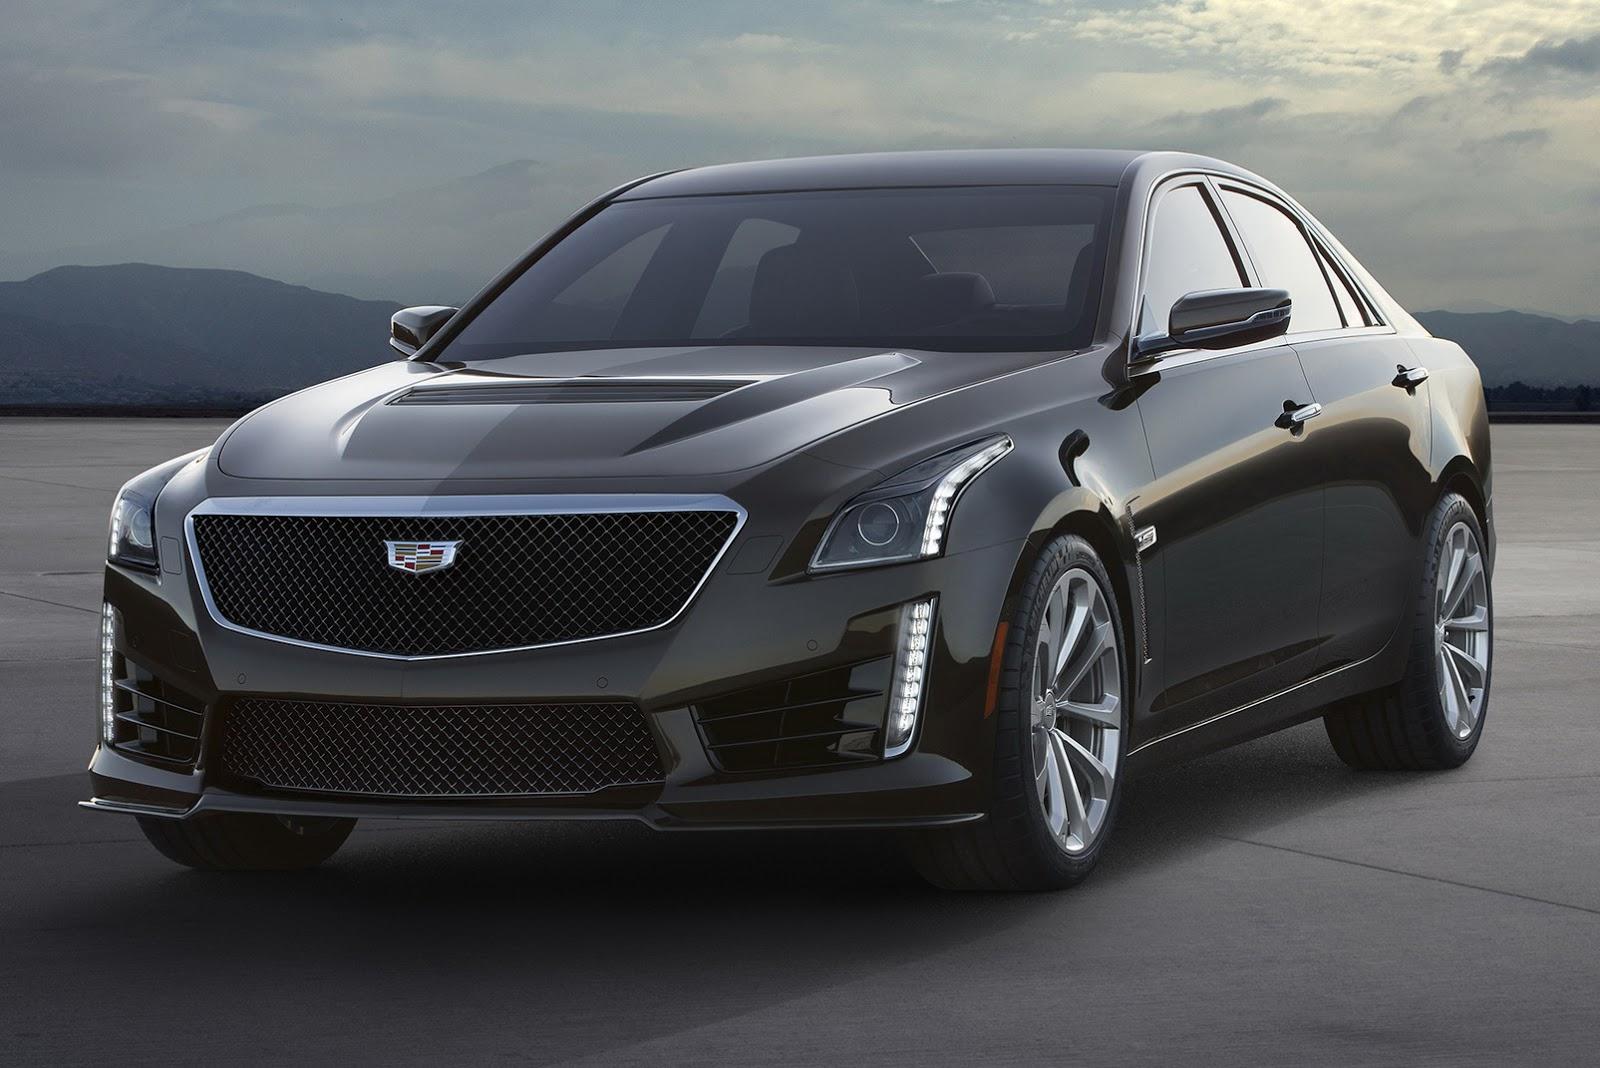 New 2016 Cadillac CTS-V Has 640HP Supercharged V8, Reaches